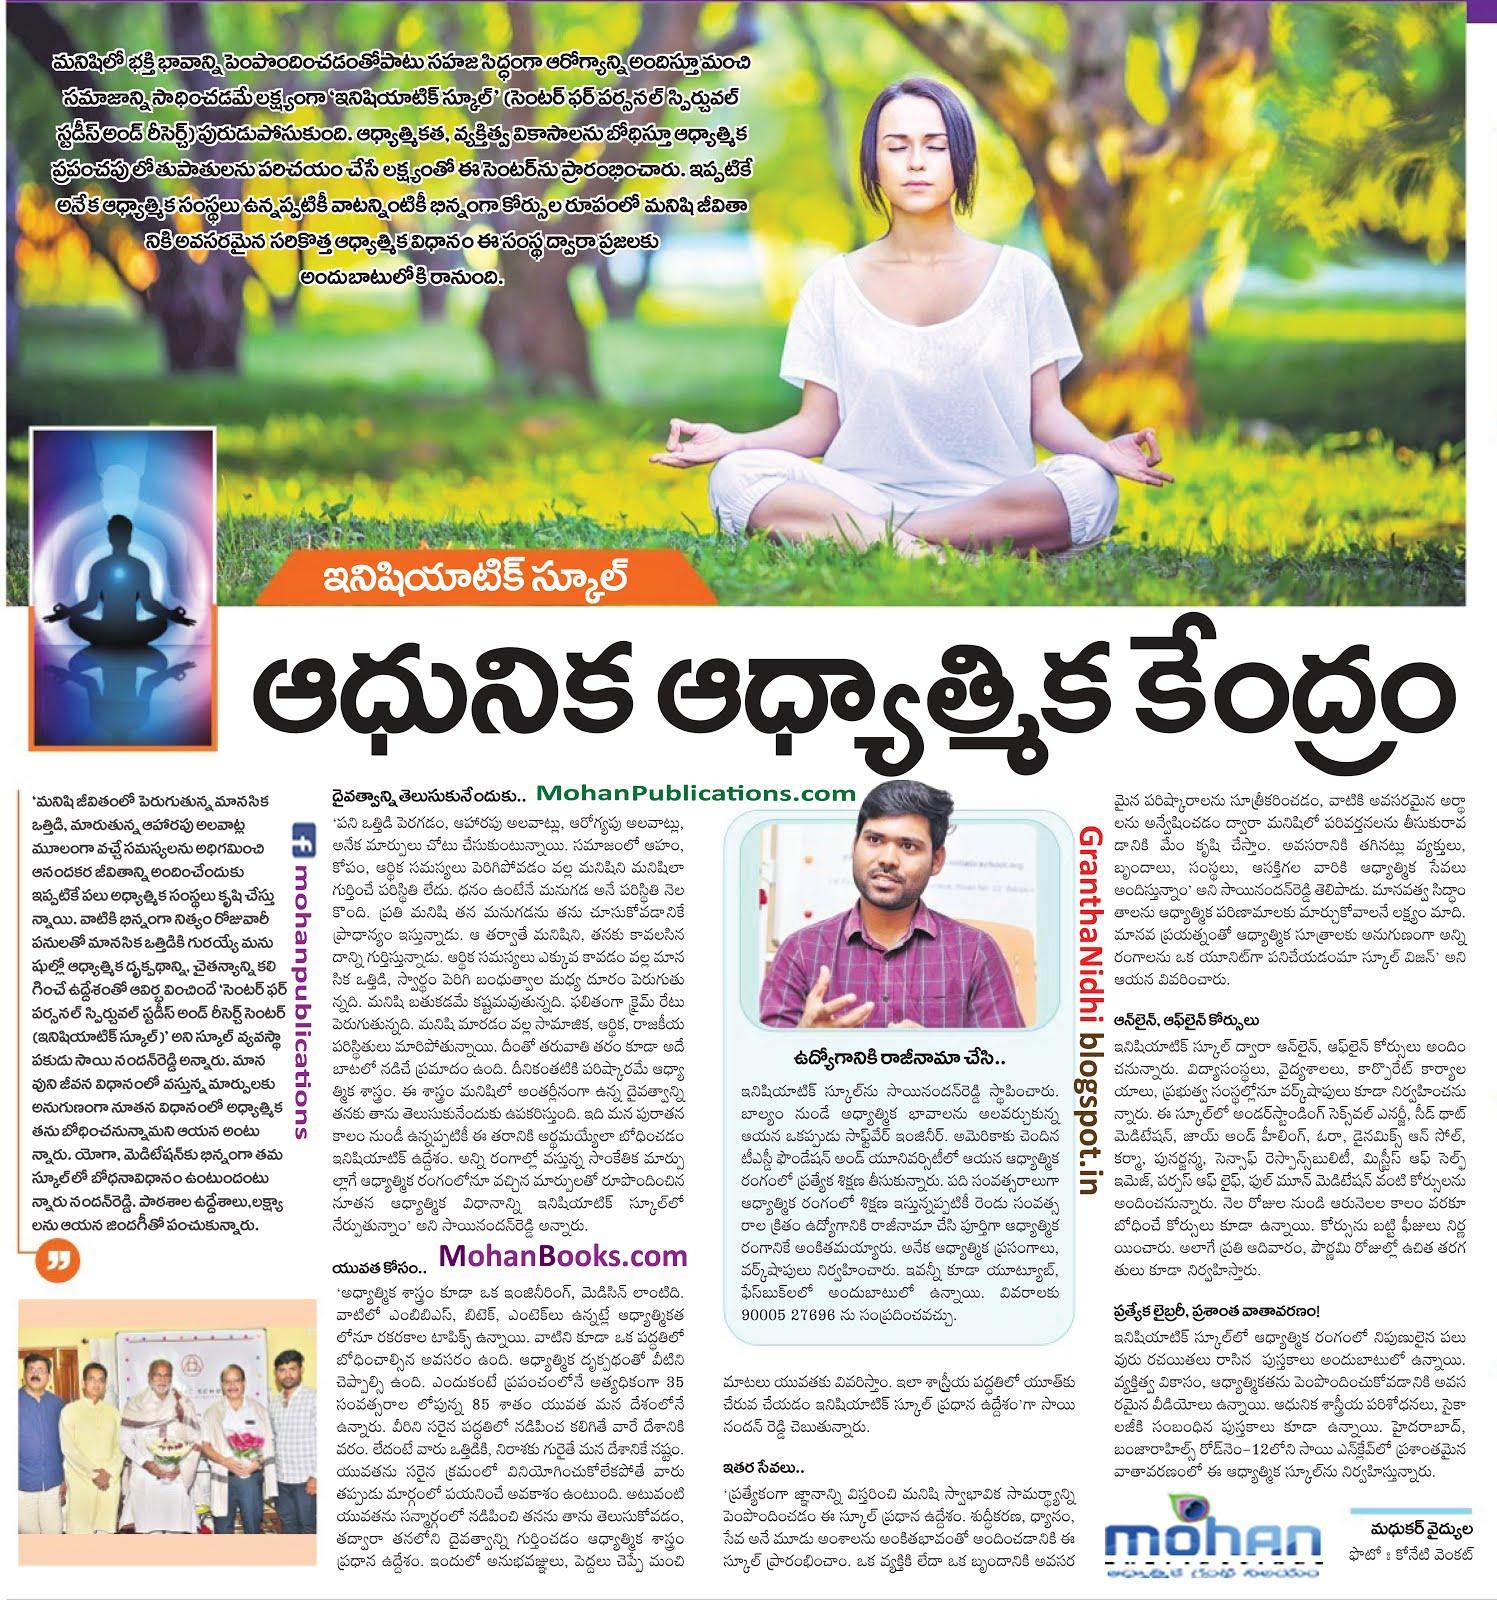 Publications in Rajahmundry, Books Publisher in Rajahmundry, Popular Publisher in Rajahmundry, BhaktiPustakalu, Makarandam, Bhakthi Pustakalu, JYOTHISA,VASTU,MANTRA, TANTRA,YANTRA,RASIPALITALU, BHAKTI,LEELA,BHAKTHI SONGS, BHAKTHI,LAGNA,PURANA,NOMULU, VRATHAMULU,POOJALU,  KALABHAIRAVAGURU, SAHASRANAMAMULU,KAVACHAMULU, ASHTORAPUJA,KALASAPUJALU, KUJA DOSHA,DASAMAHAVIDYA, SADHANALU,MOHAN PUBLICATIONS, RAJAHMUNDRY BOOK STORE, BOOKS,DEVOTIONAL BOOKS, KALABHAIRAVA GURU,KALABHAIRAVA, RAJAMAHENDRAVARAM,GODAVARI,GOWTHAMI, FORTGATE,KOTAGUMMAM,GODAVARI RAILWAY STATION, PRINT BOOKS,E BOOKS,PDF BOOKS, FREE PDF BOOKS,BHAKTHI MANDARAM,GRANTHANIDHI, GRANDANIDI,GRANDHANIDHI, BHAKTHI PUSTHAKALU, BHAKTI PUSTHAKALU, BHAKTHI